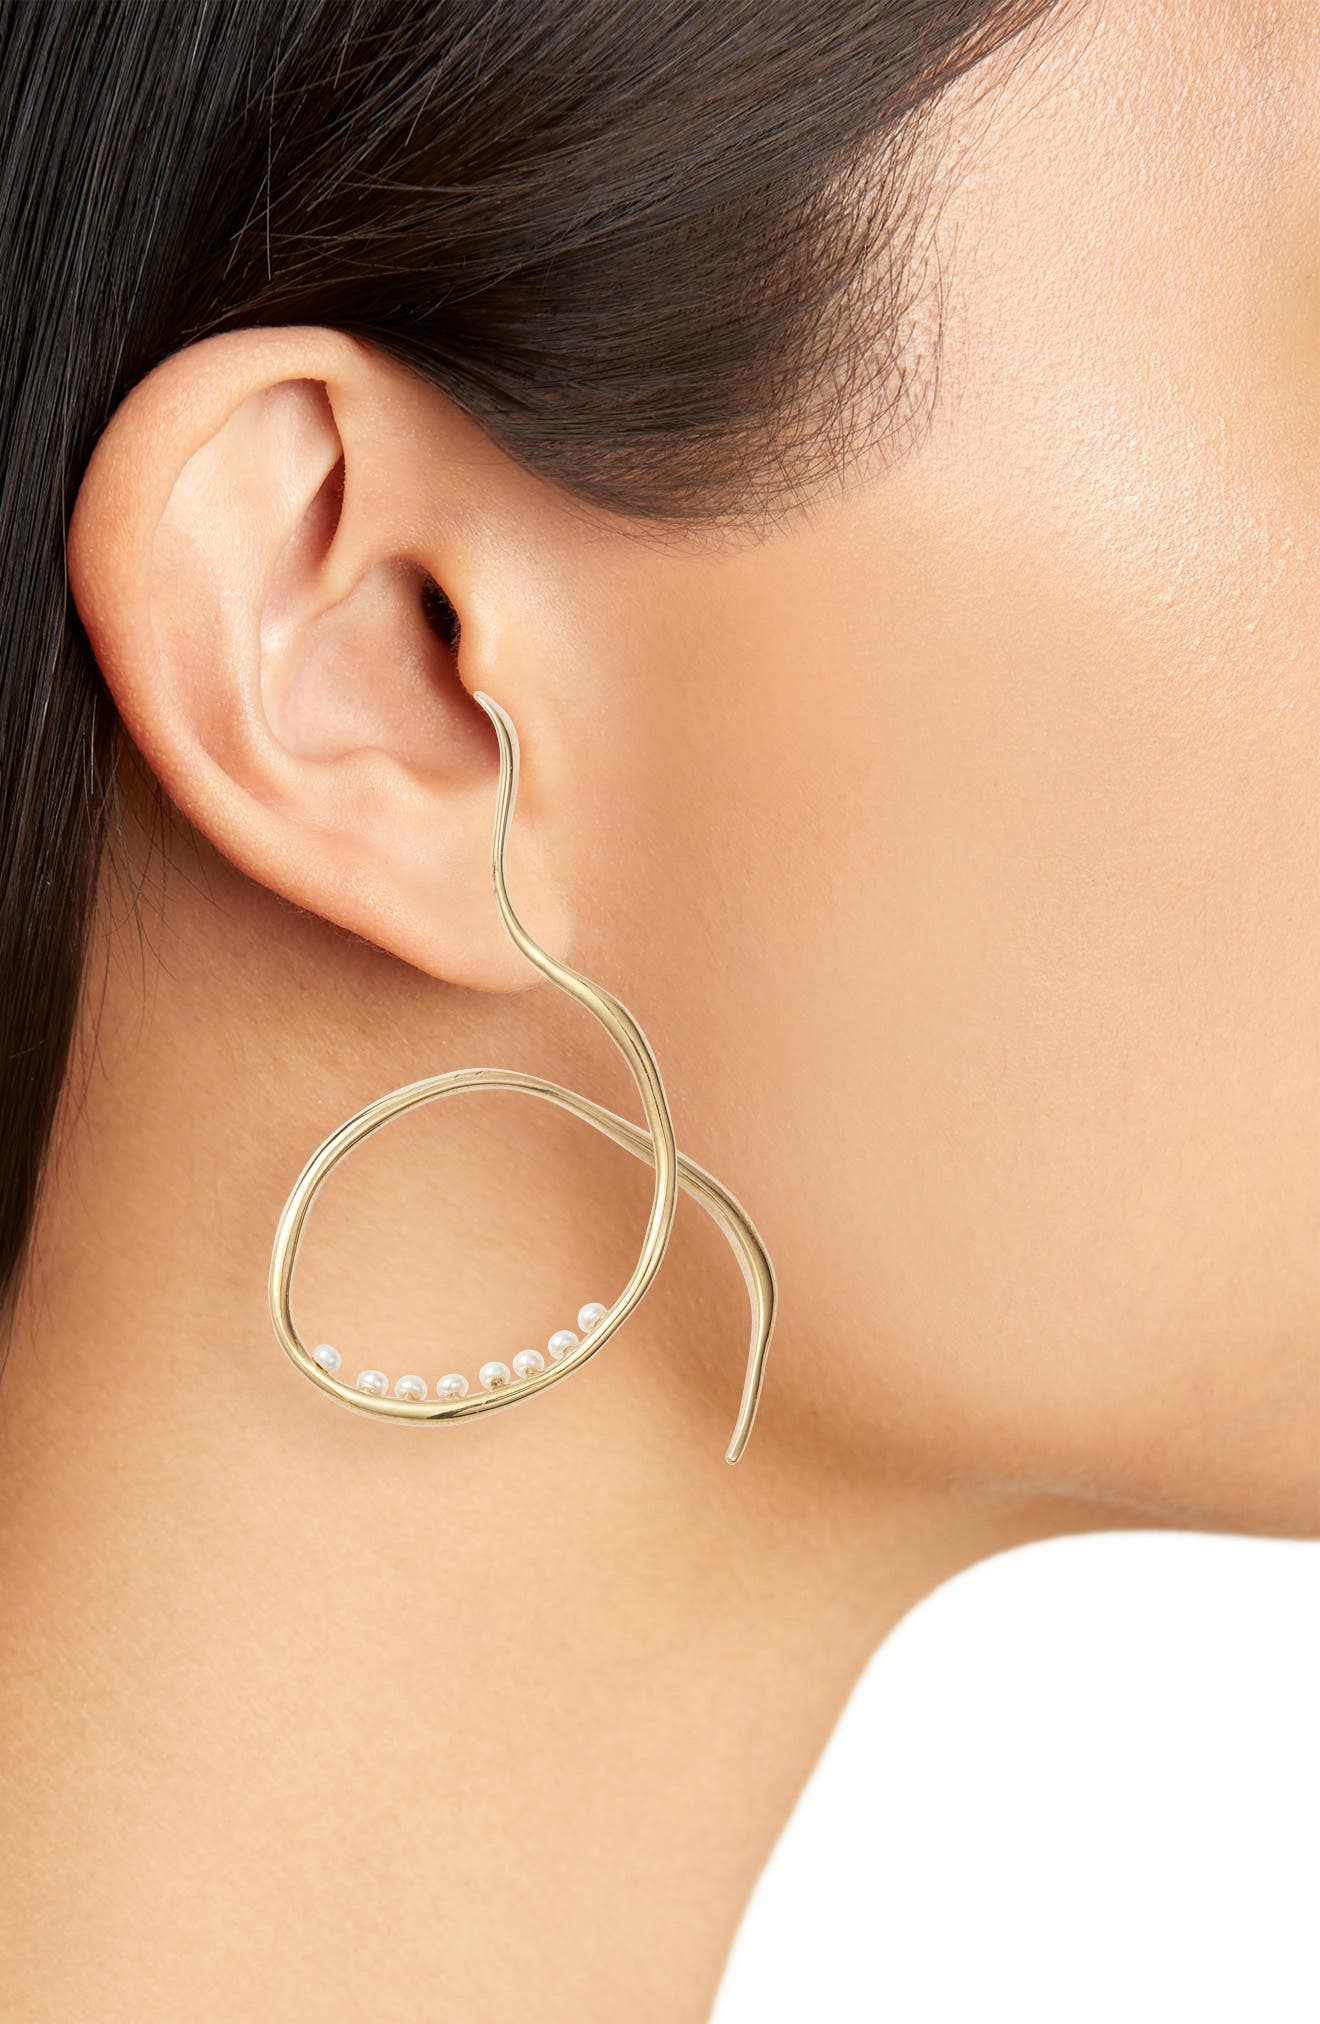 Vinea Freshwater Pearl Earrings,                             Alternate thumbnail 2, color,                             BRONZE